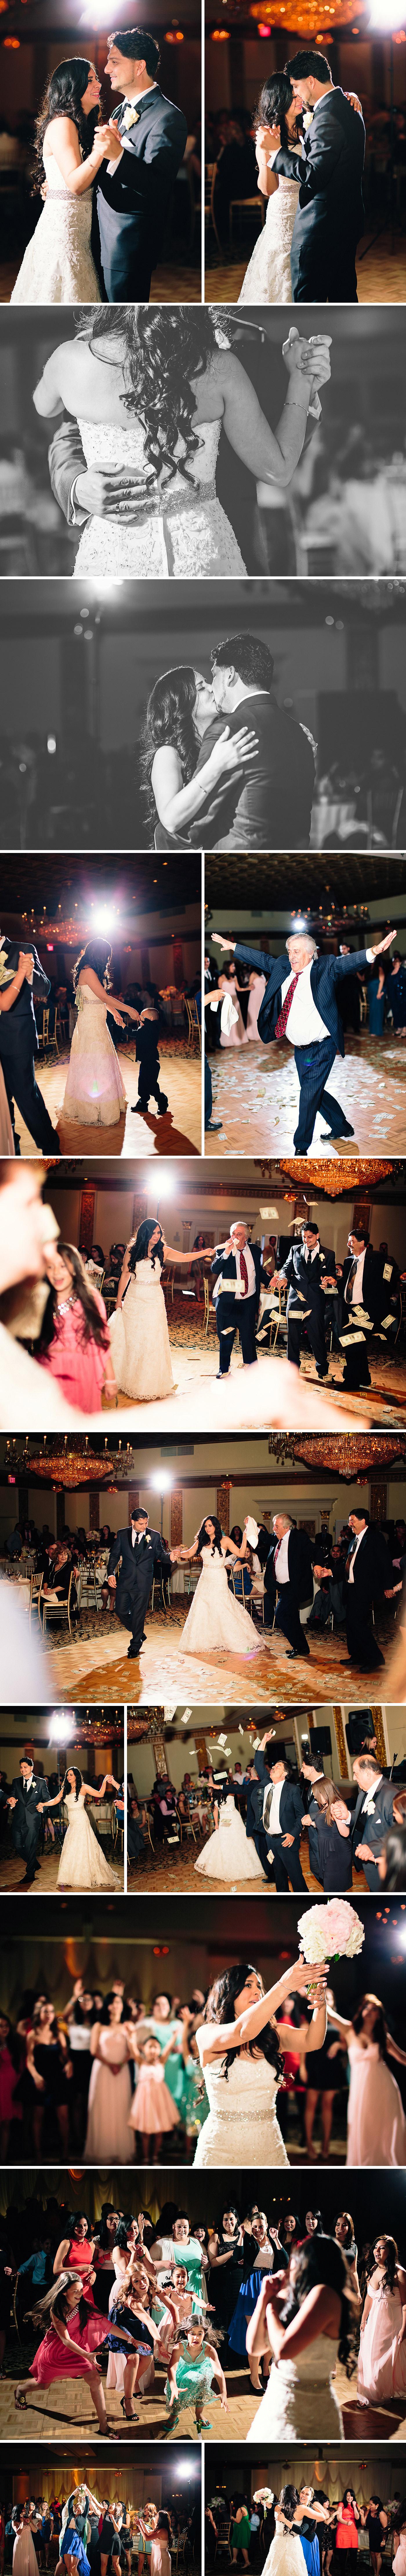 Chicago_Fine_Art_Wedding_Photography_liza1.jpg